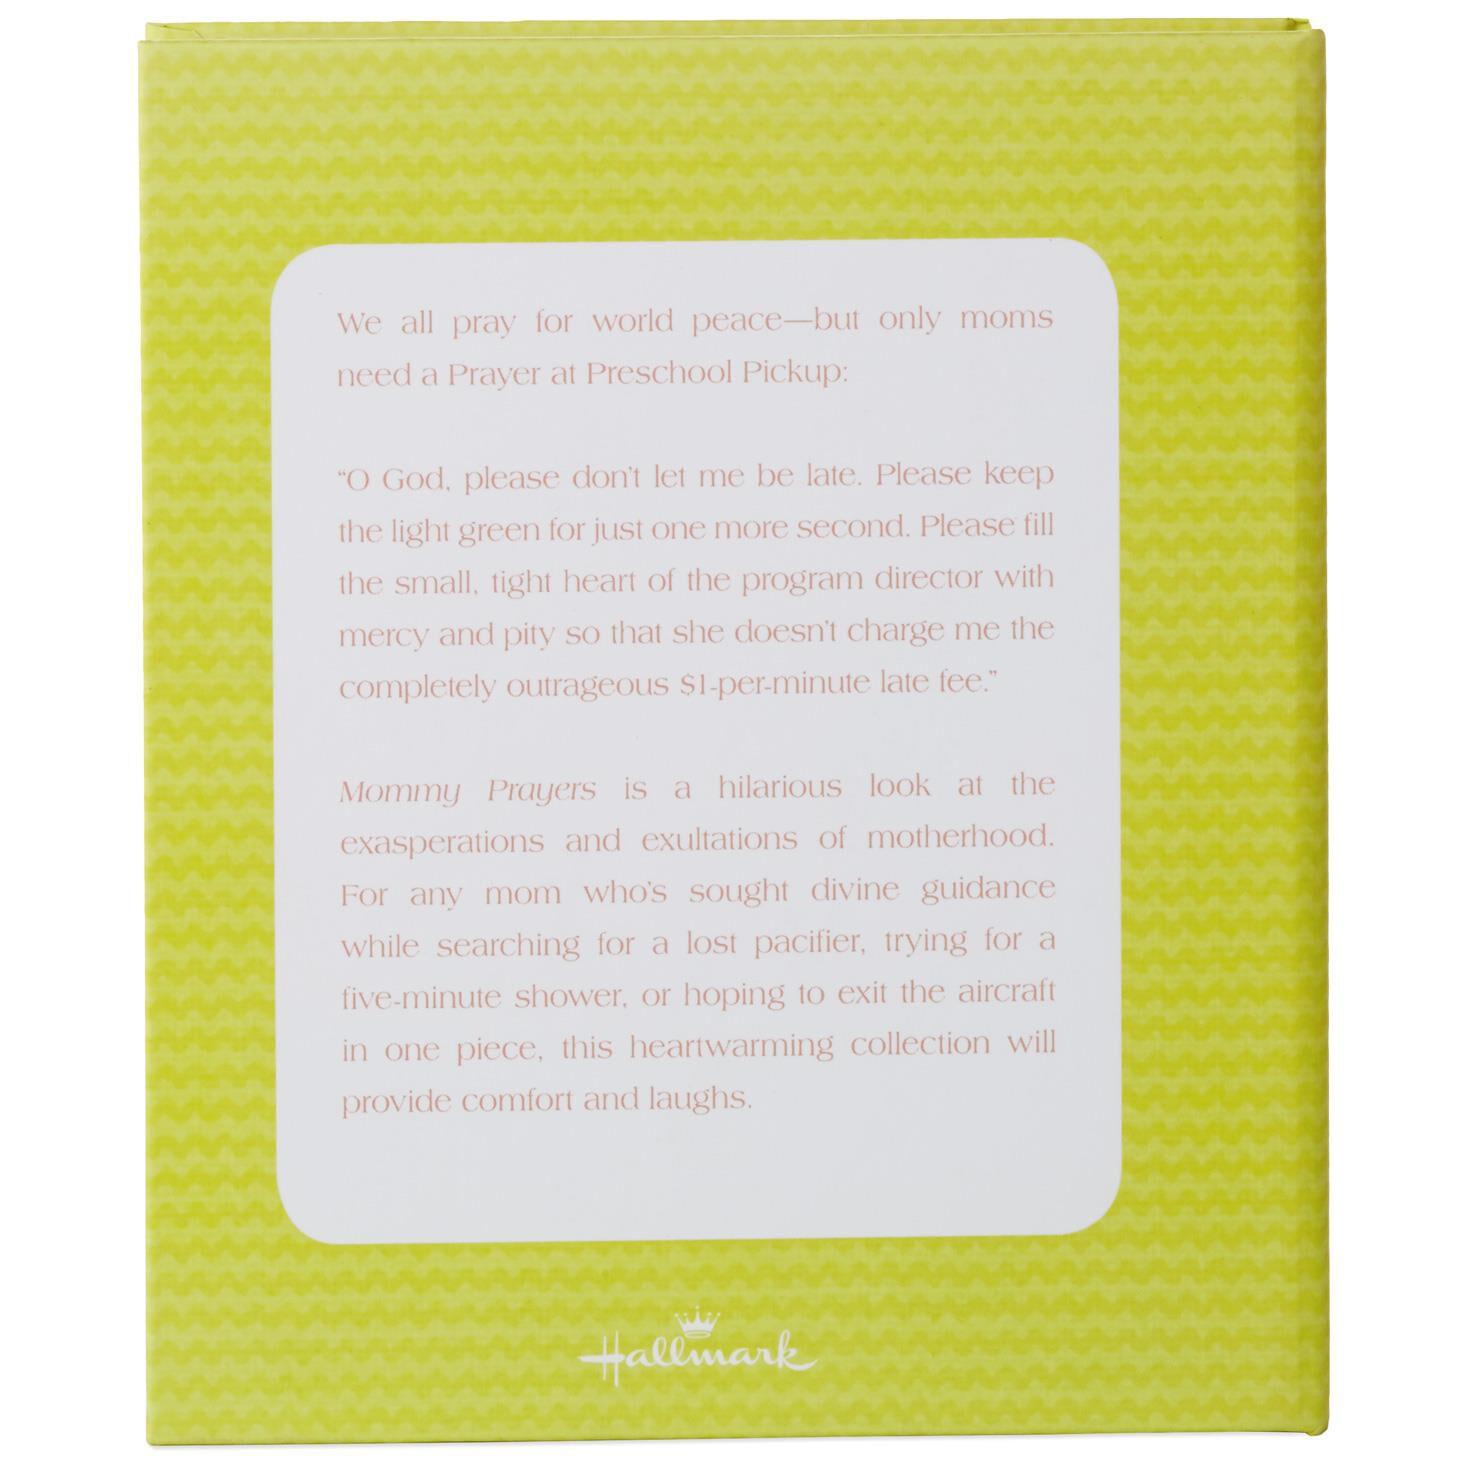 image regarding Moms in Prayer Sheets titled Moms Working day Hallmark